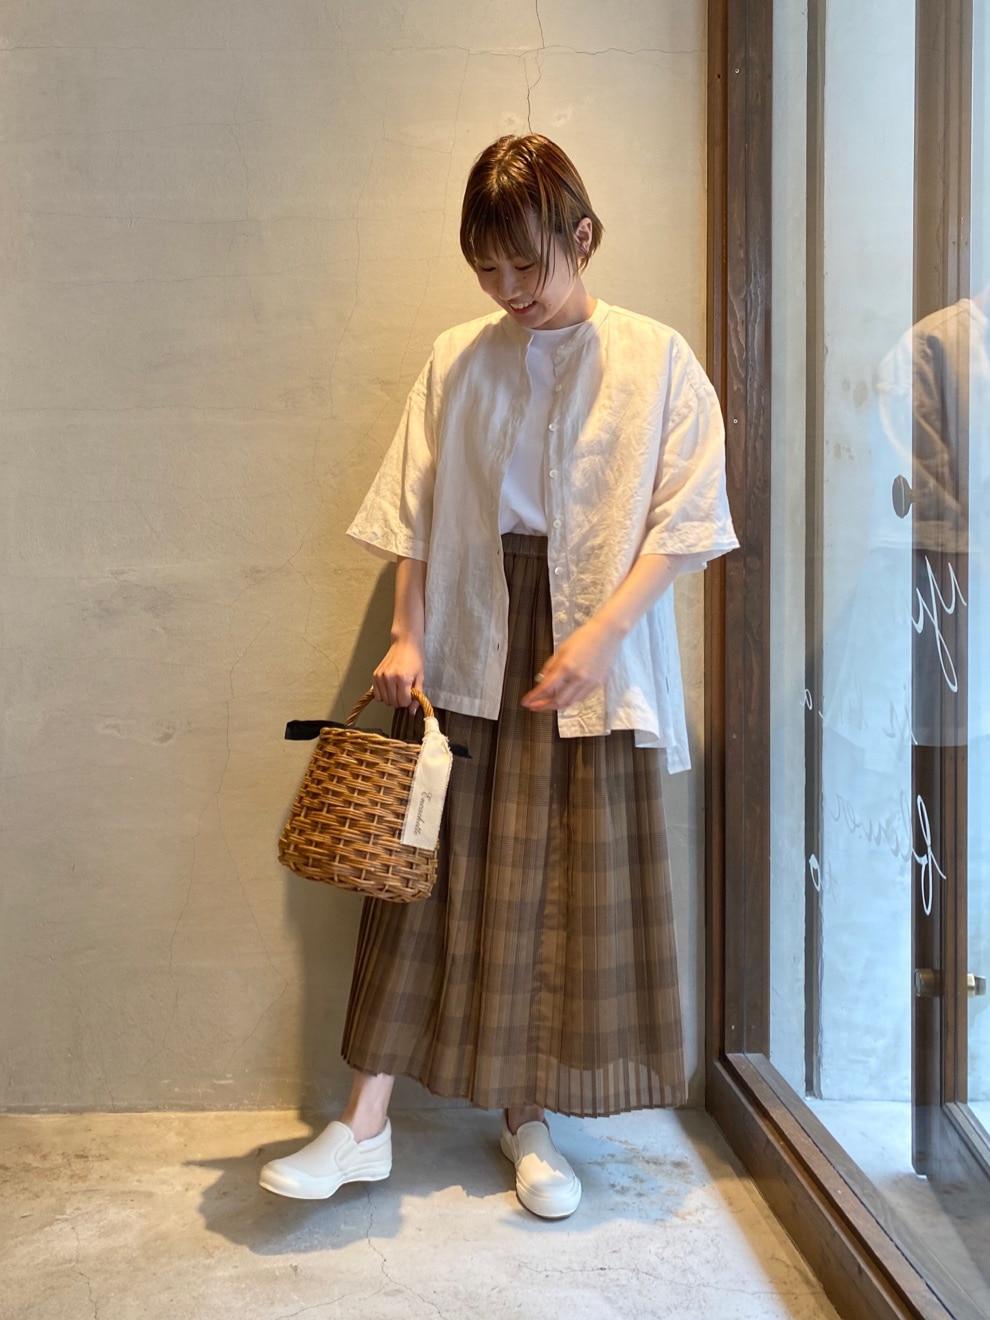 yuni 神戸路面 身長:155cm 2021.05.11